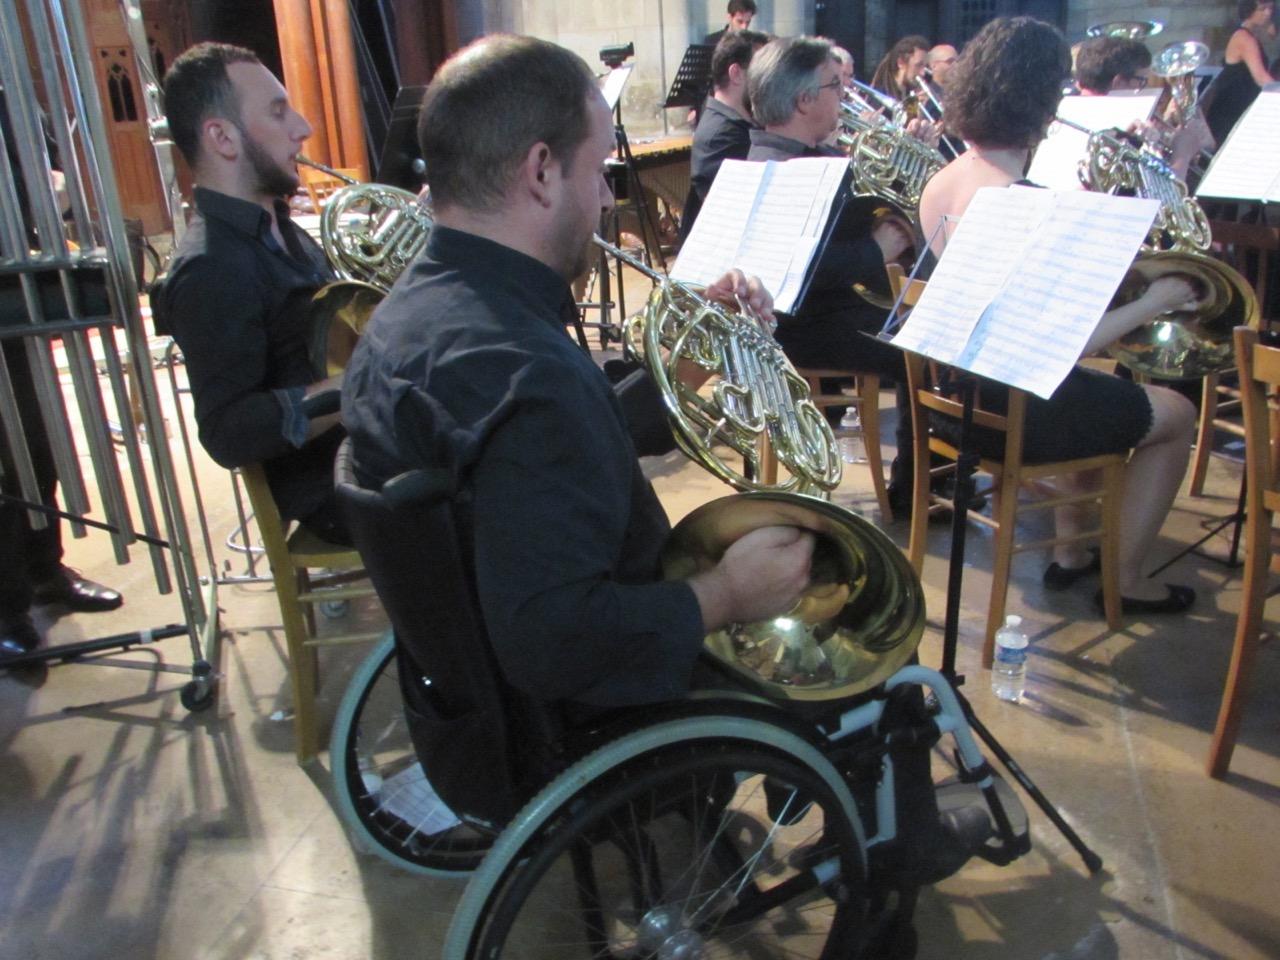 2018-05-ConcertChalonsEnChampagne - 56